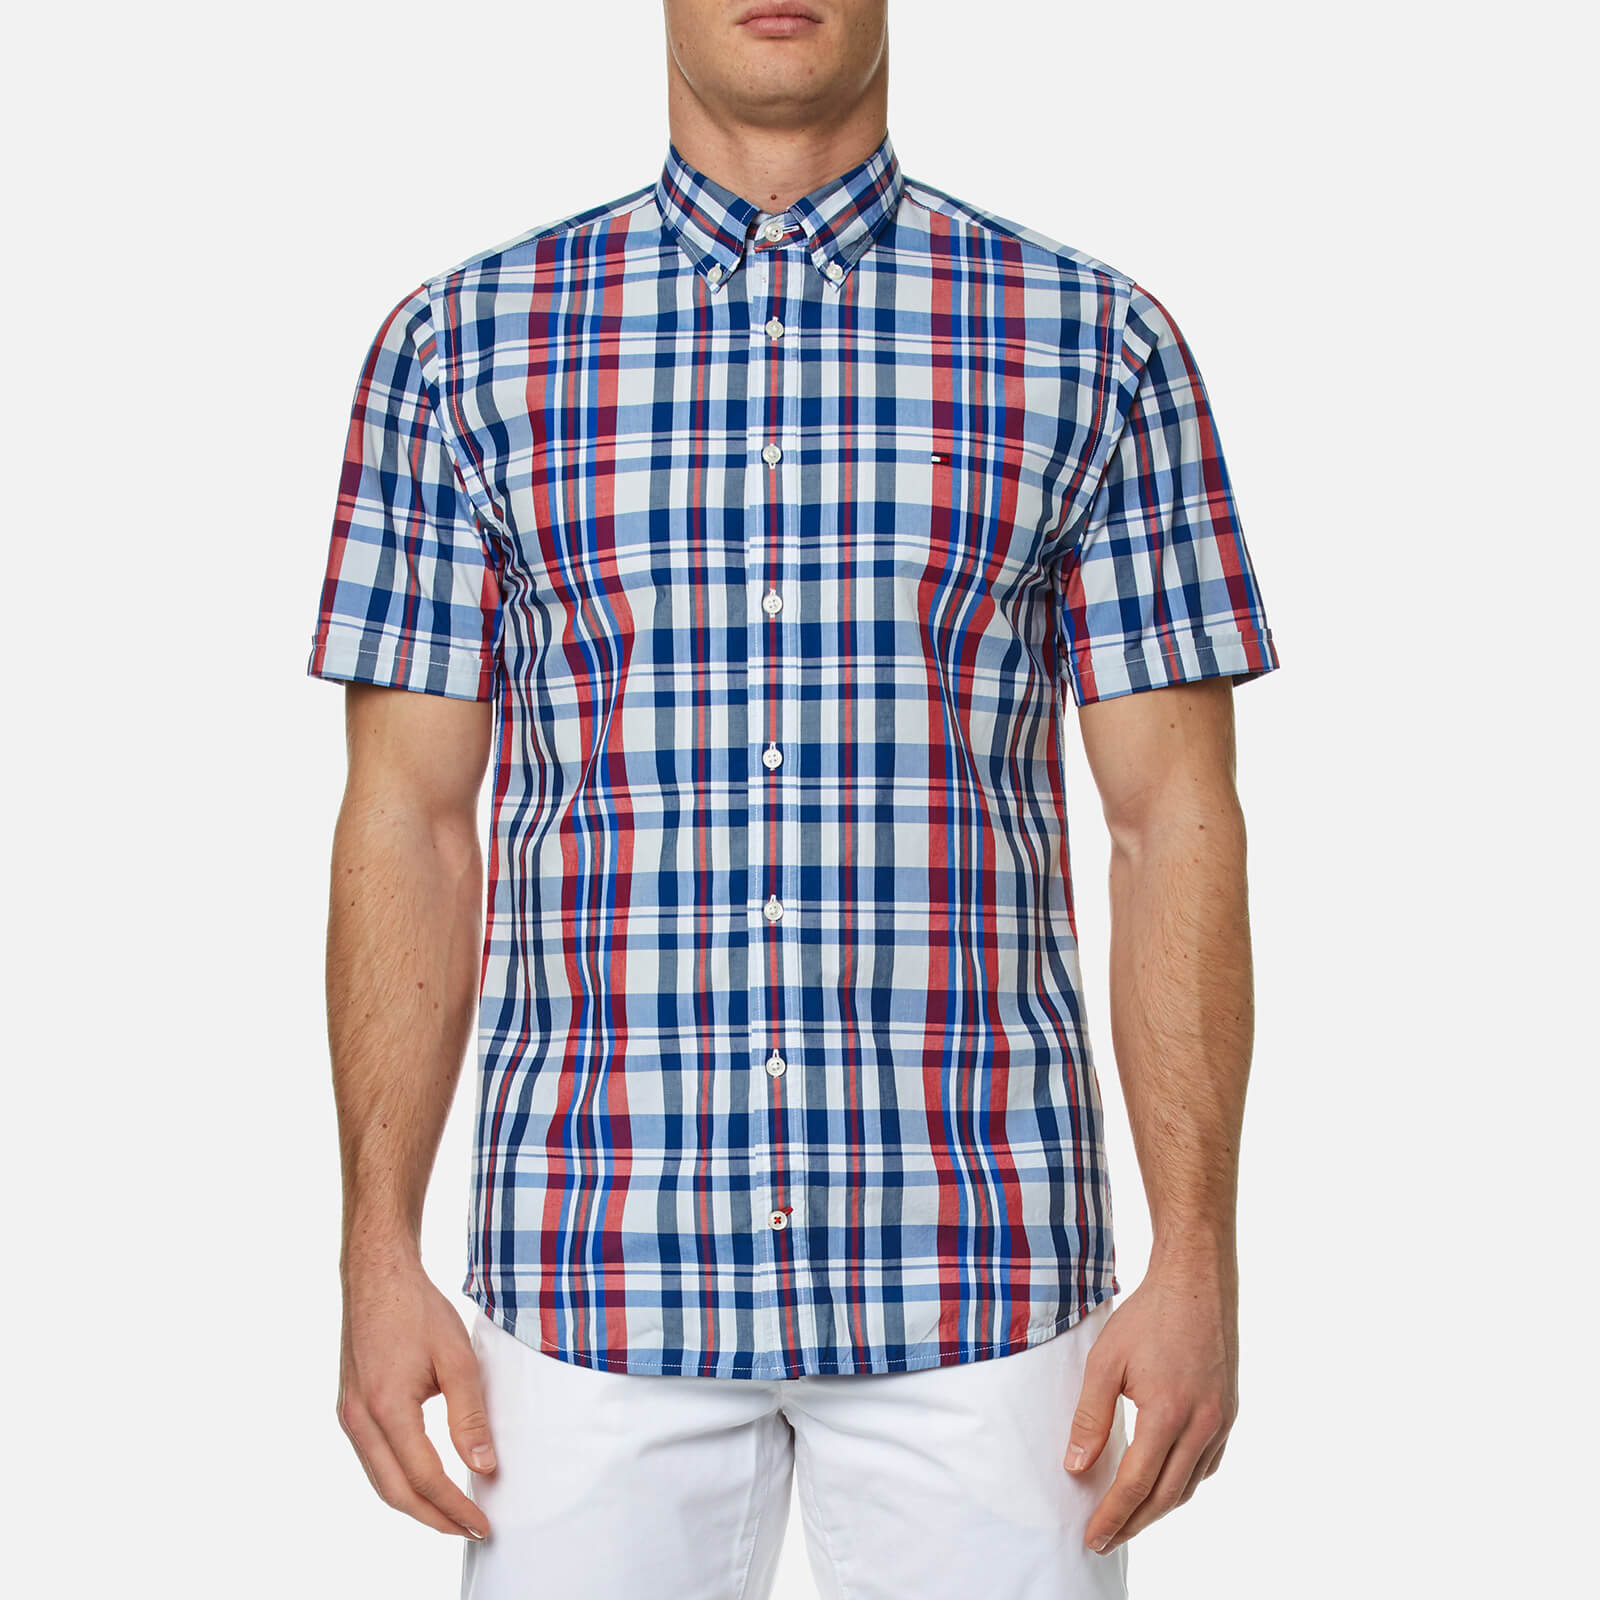 d1432617 Tommy Hilfiger Men's Lester Check Short Sleeve Shirt - Blue/Apple Red - Free  UK Delivery over £50